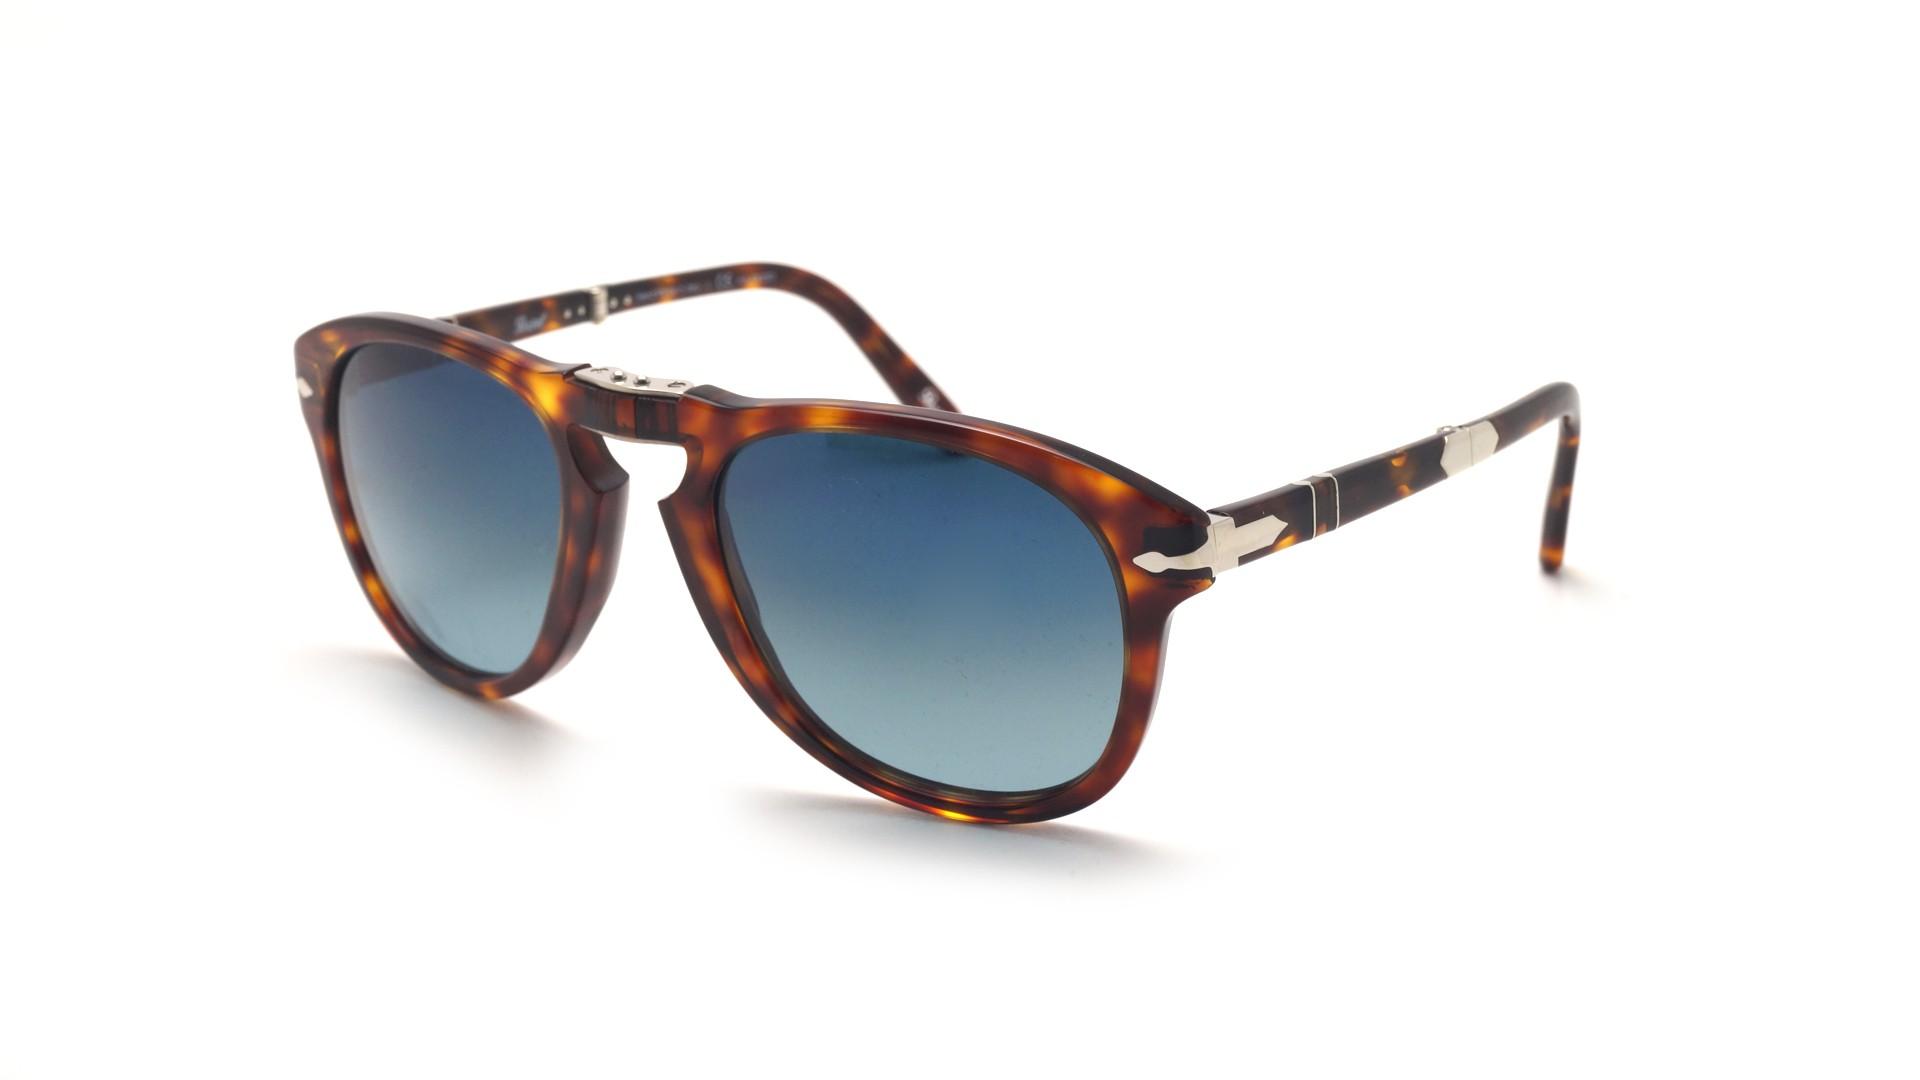 623192bc8f Sunglasses Persol Steve Mcqueen Tortoise PO0714SM 24 S3 52-21 Medium Folding  Polarized Gradient